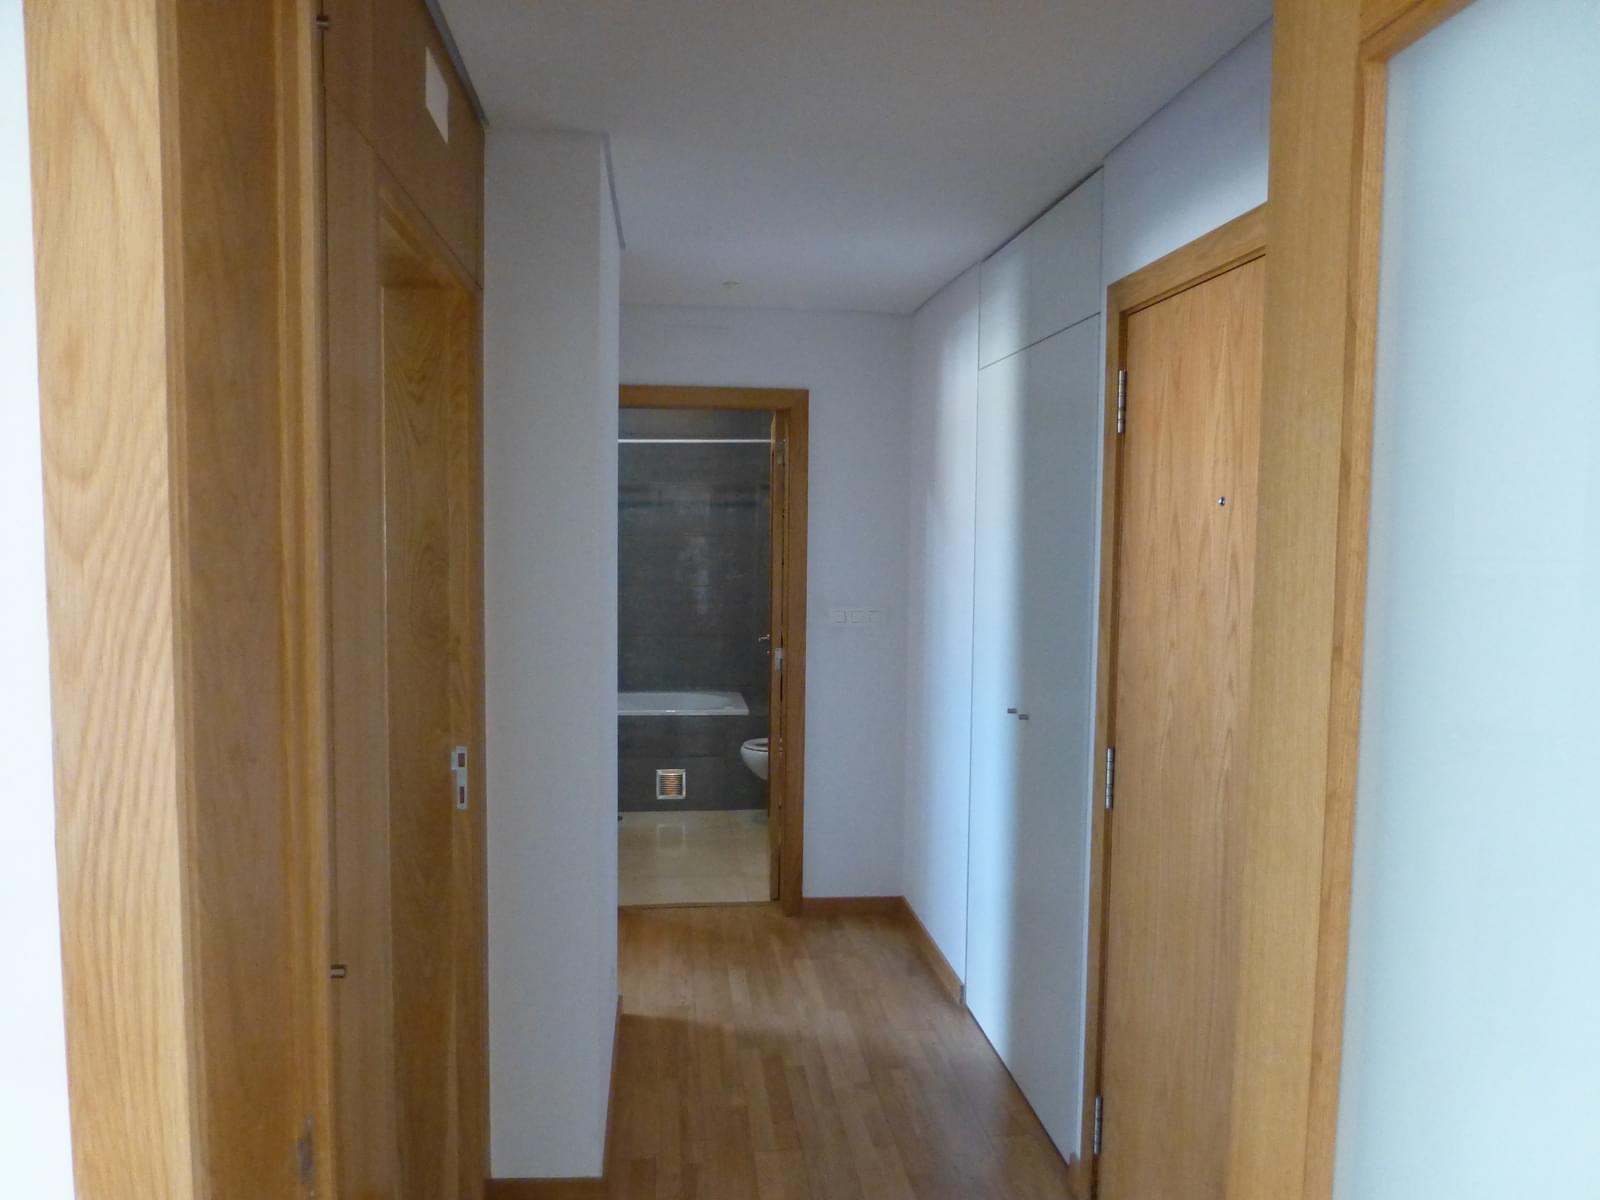 pf17050-apartamento-t1-lisboa-64debe36-8898-45df-ab88-8dddb76ede5d